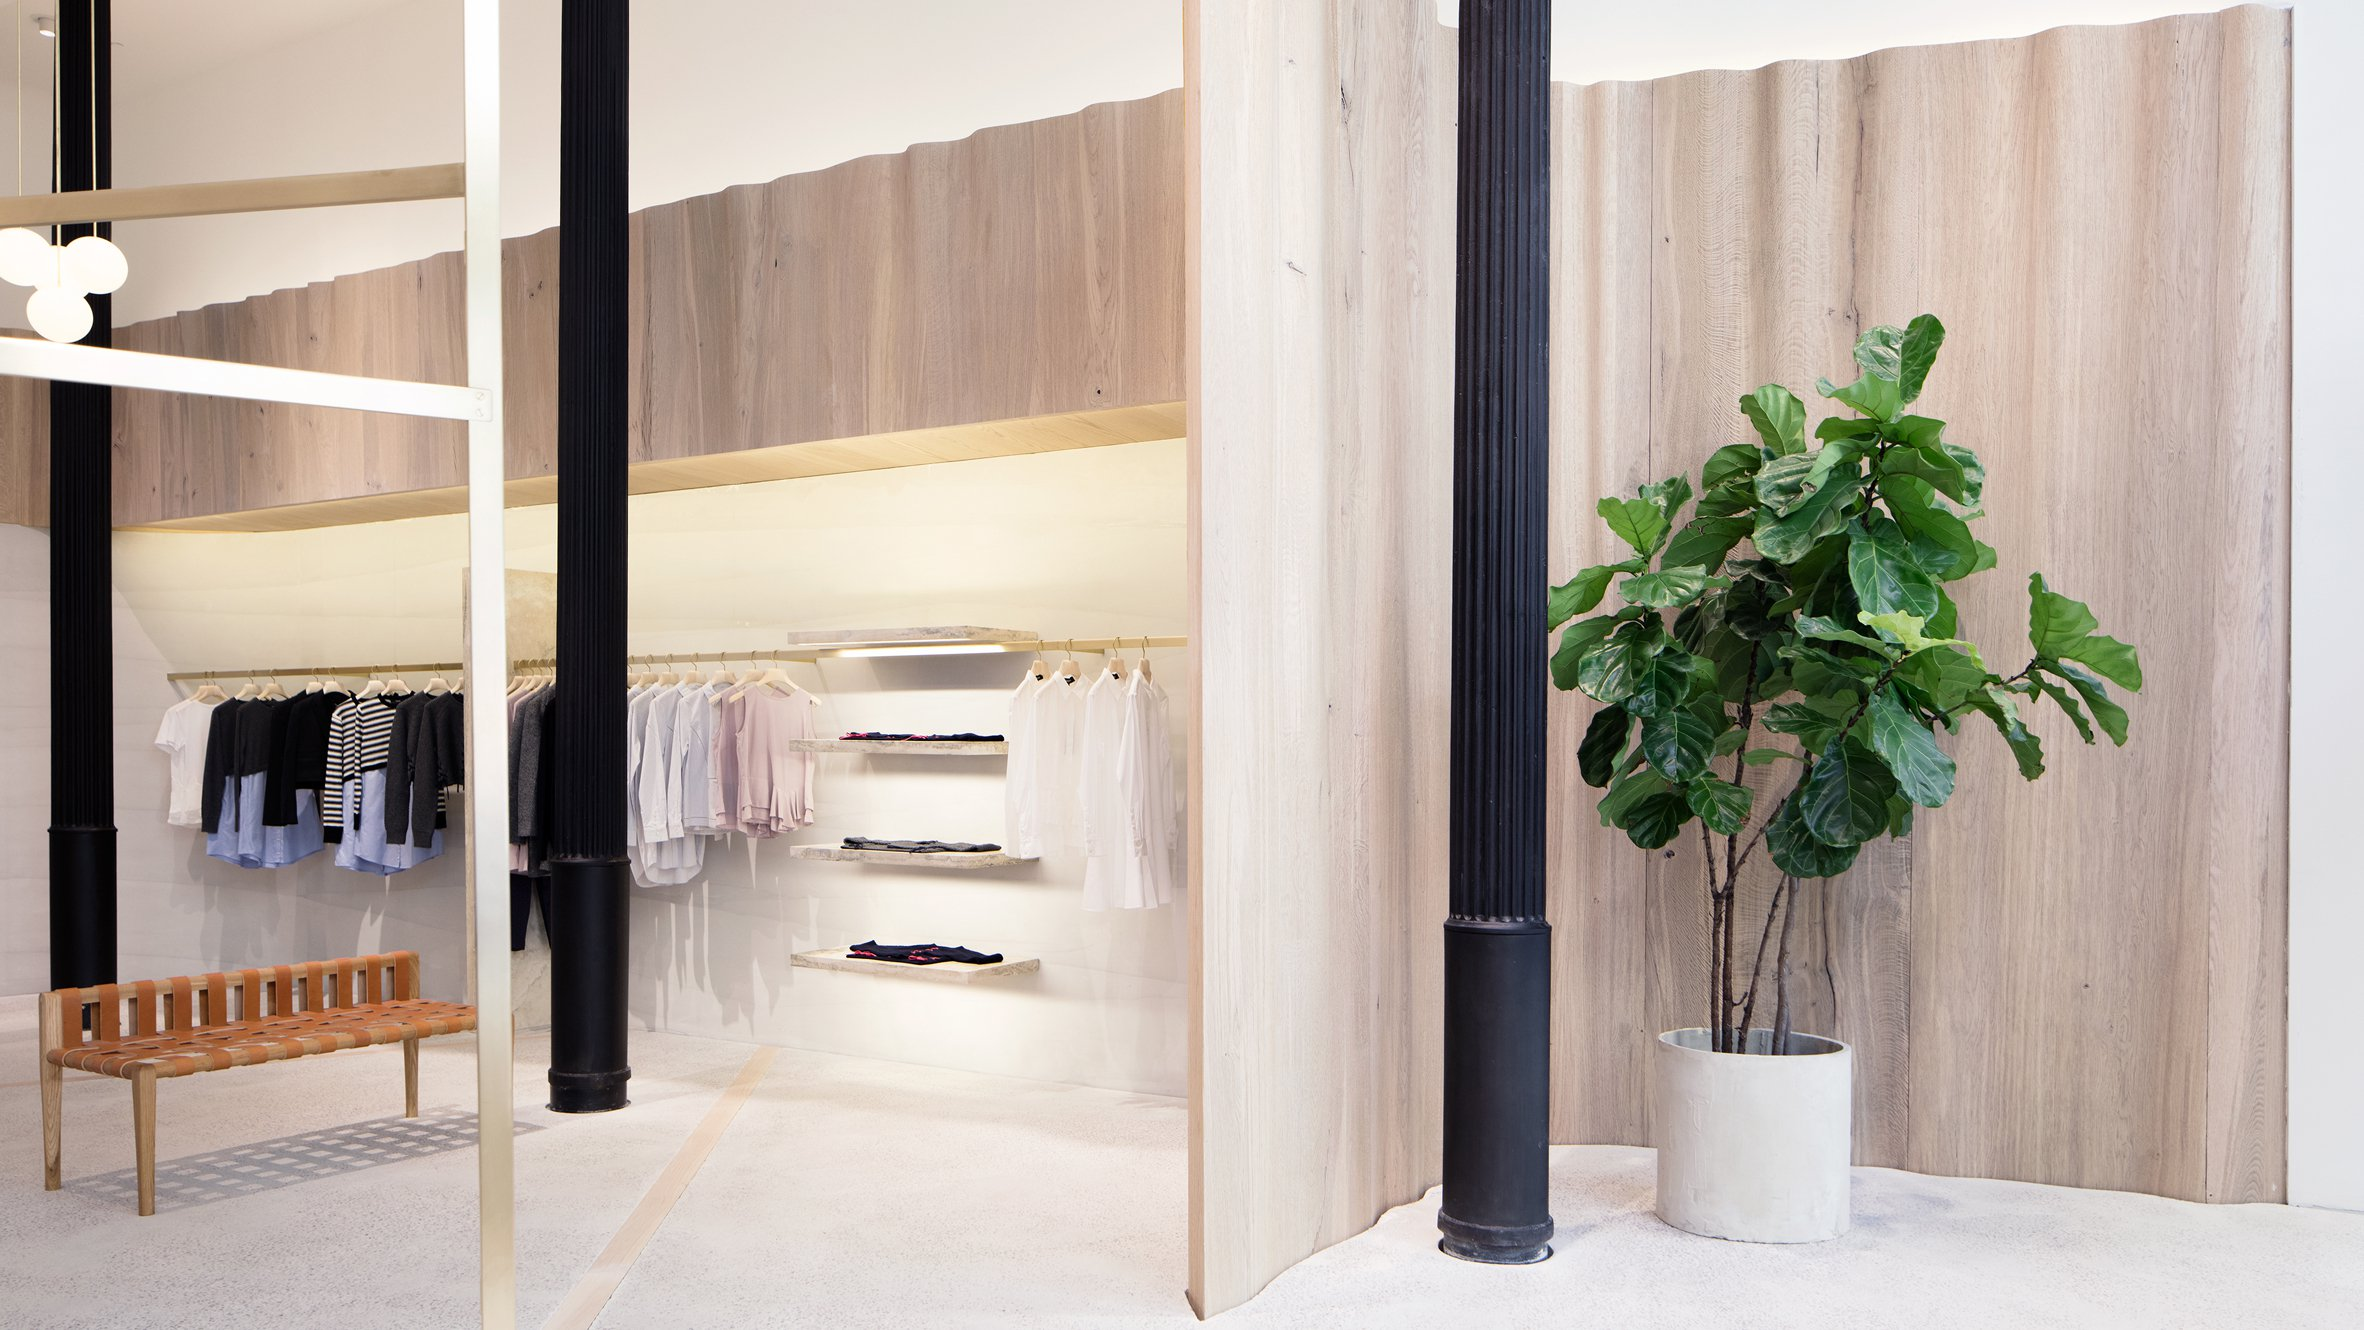 thakoon-ny-avra-madison-fashion-retail-store-shop-interior-design-fernando-mastrangelo-new-york-city-usa_dezeen_hero1